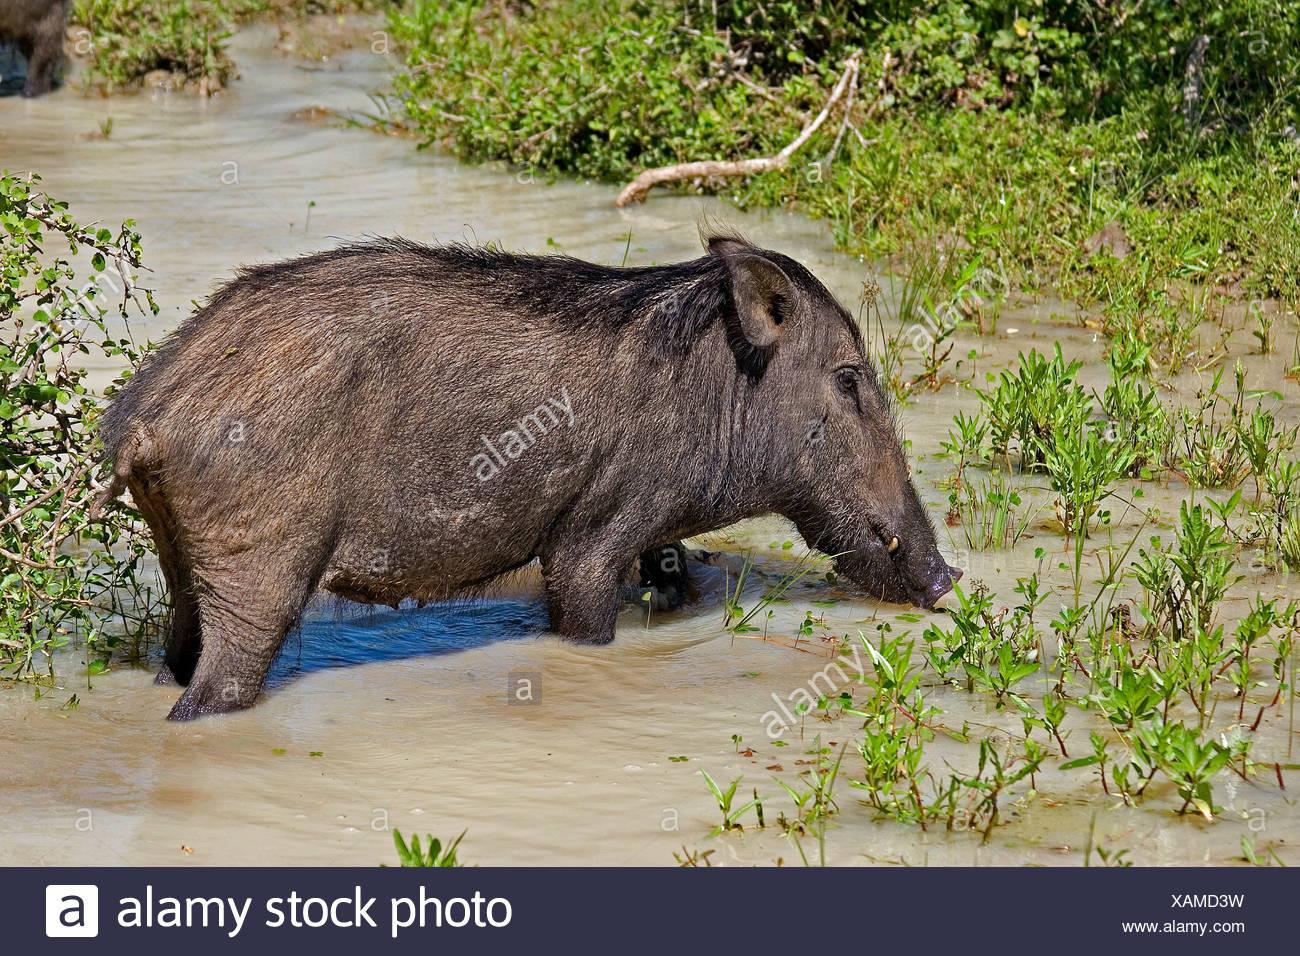 Wild boar sus scrofa Sri Lanka - Stock Image